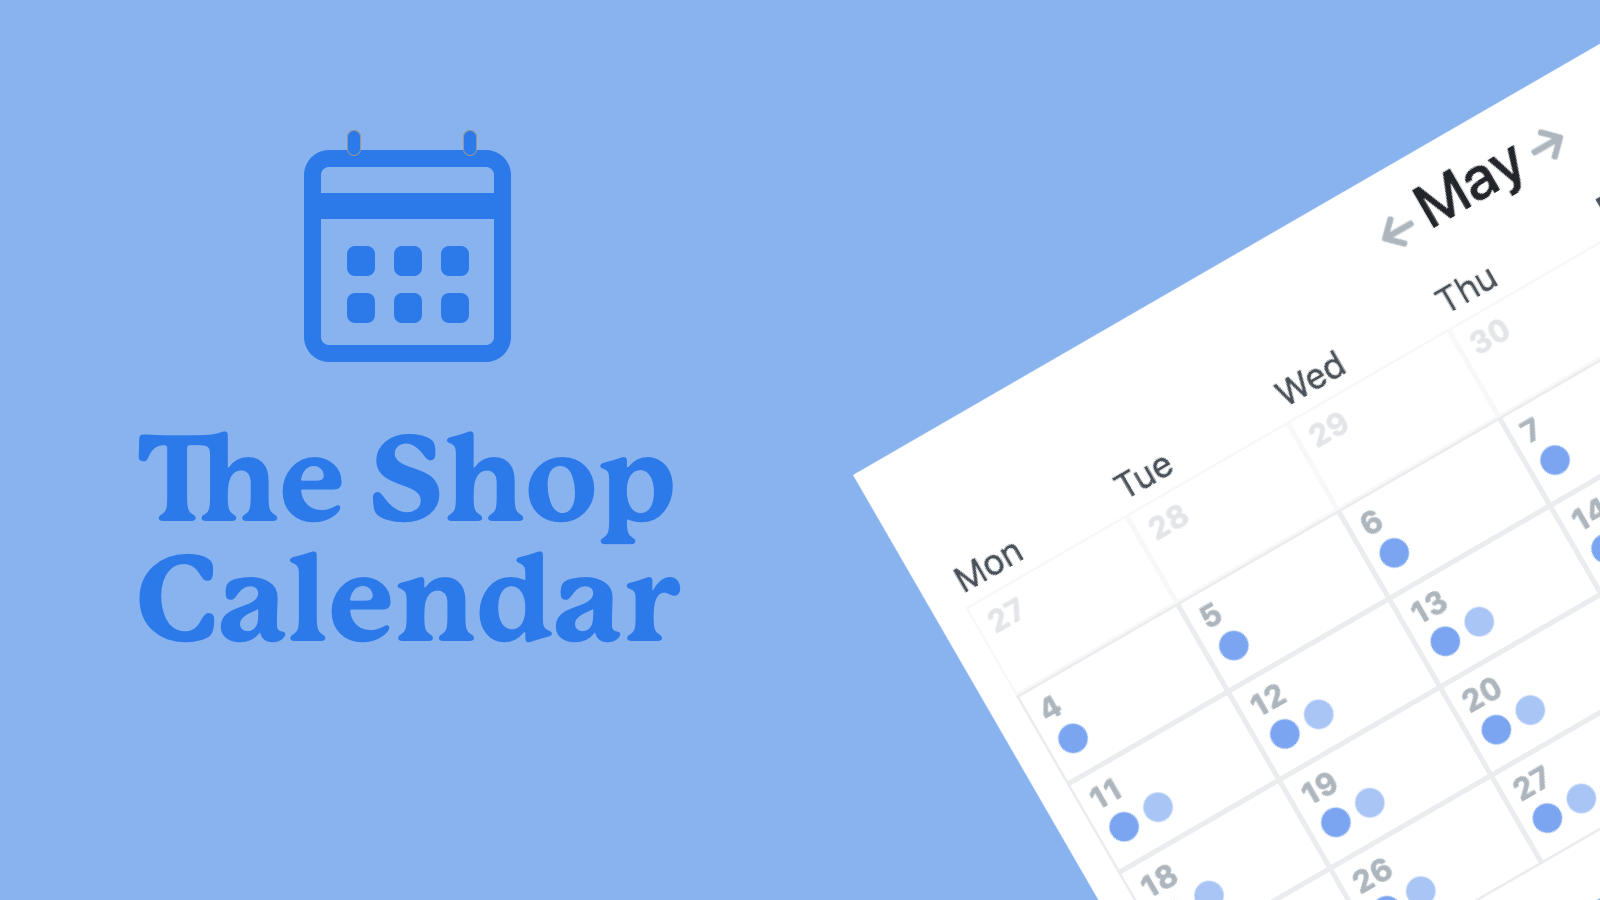 the shop calendar banner